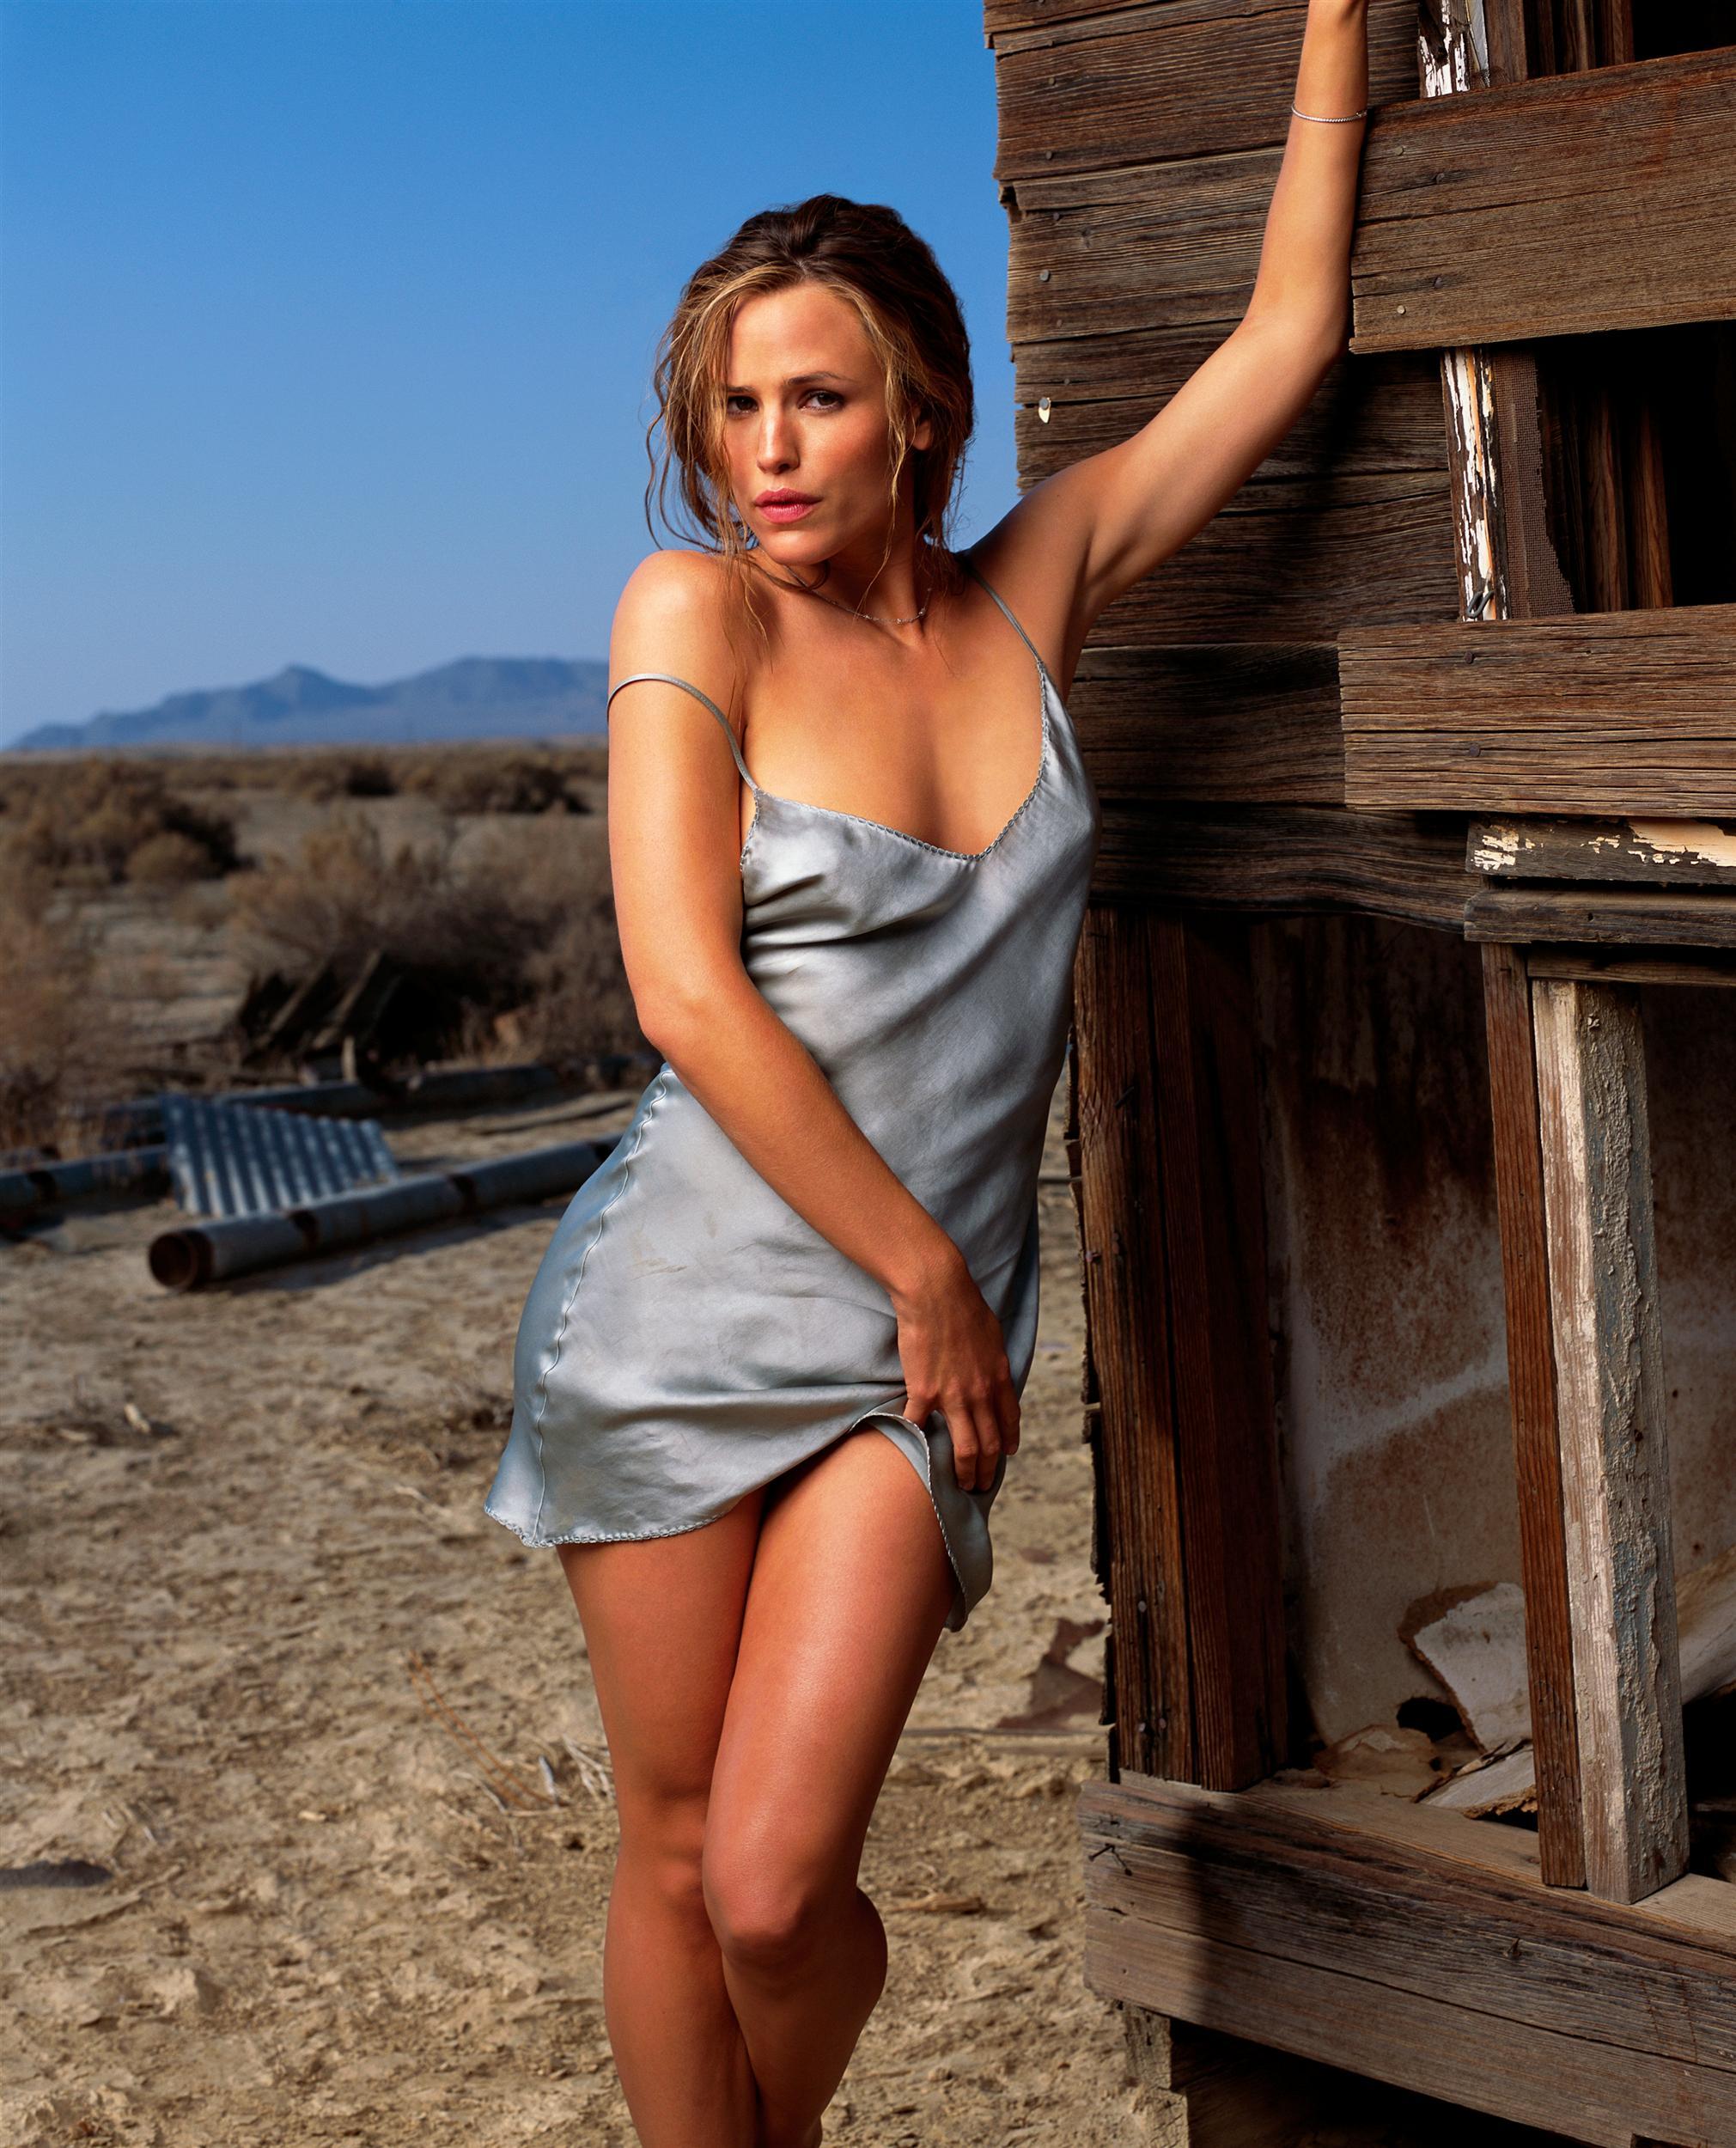 shoot Jennifer garner photo